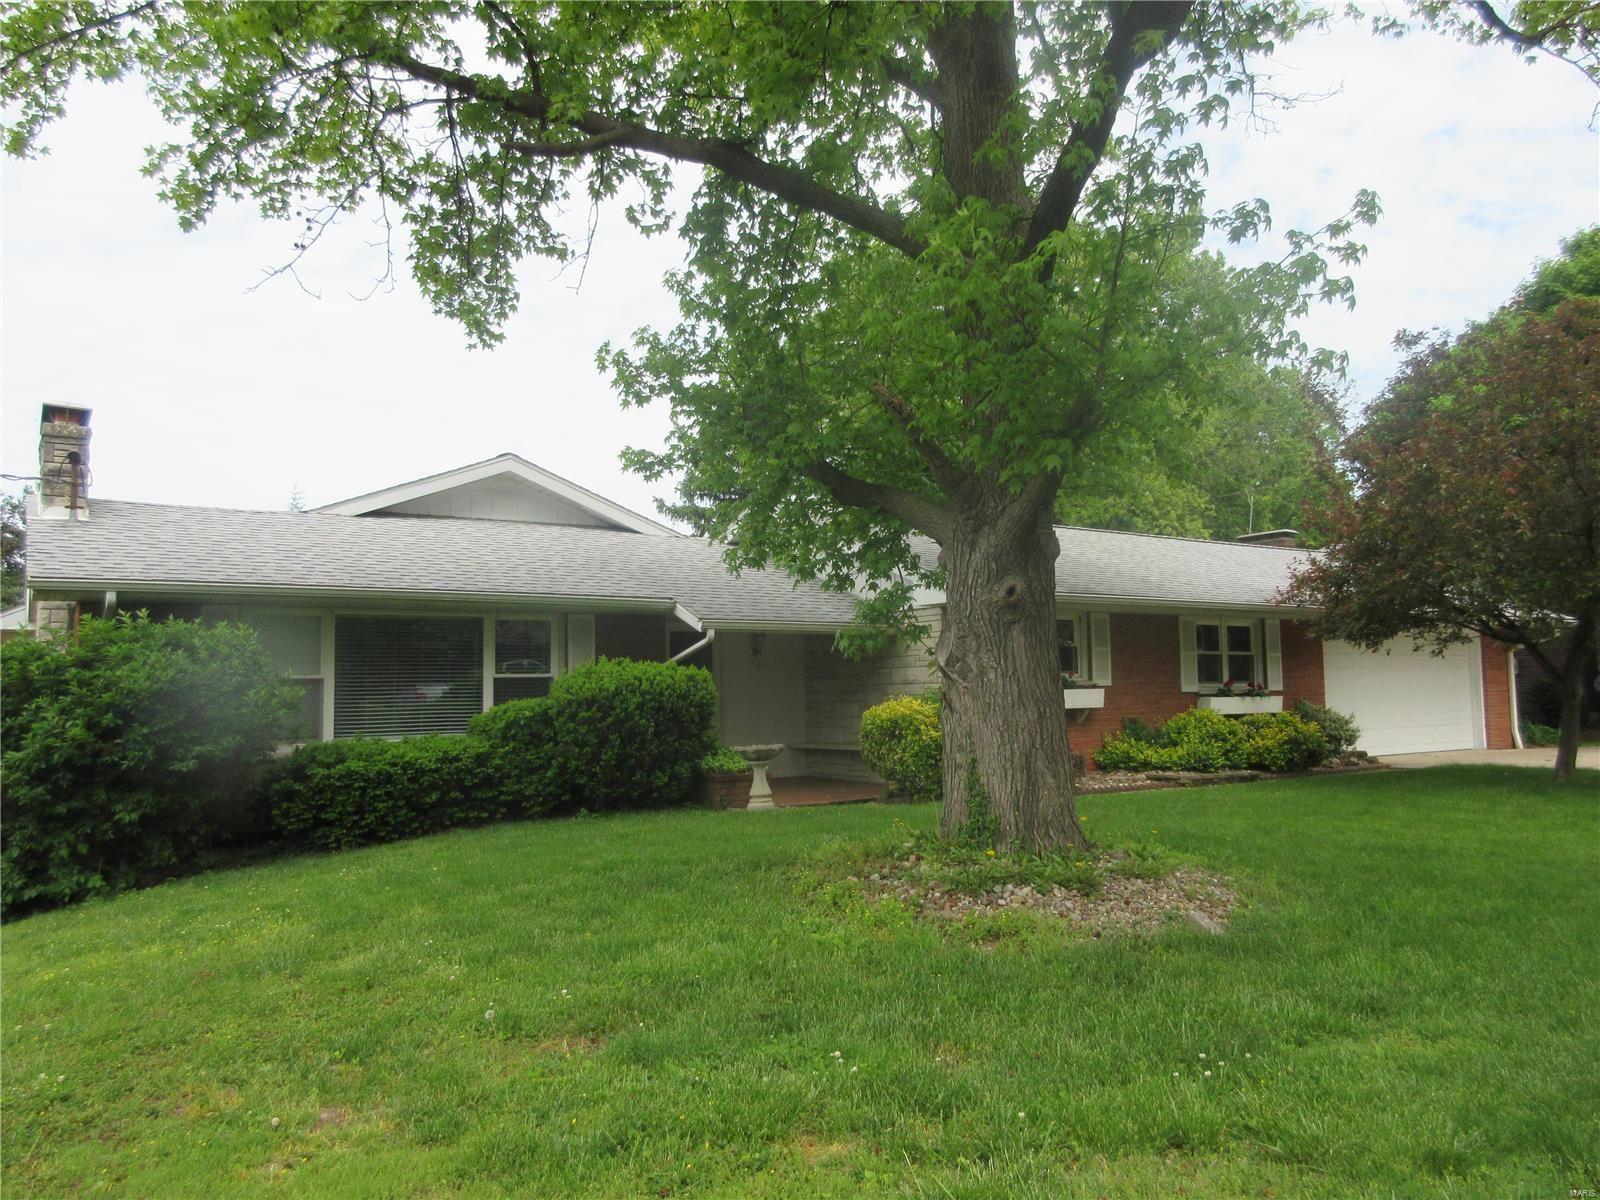 202 Westview Drive, Collinsville, IL 62234 - MLS#: 20032385